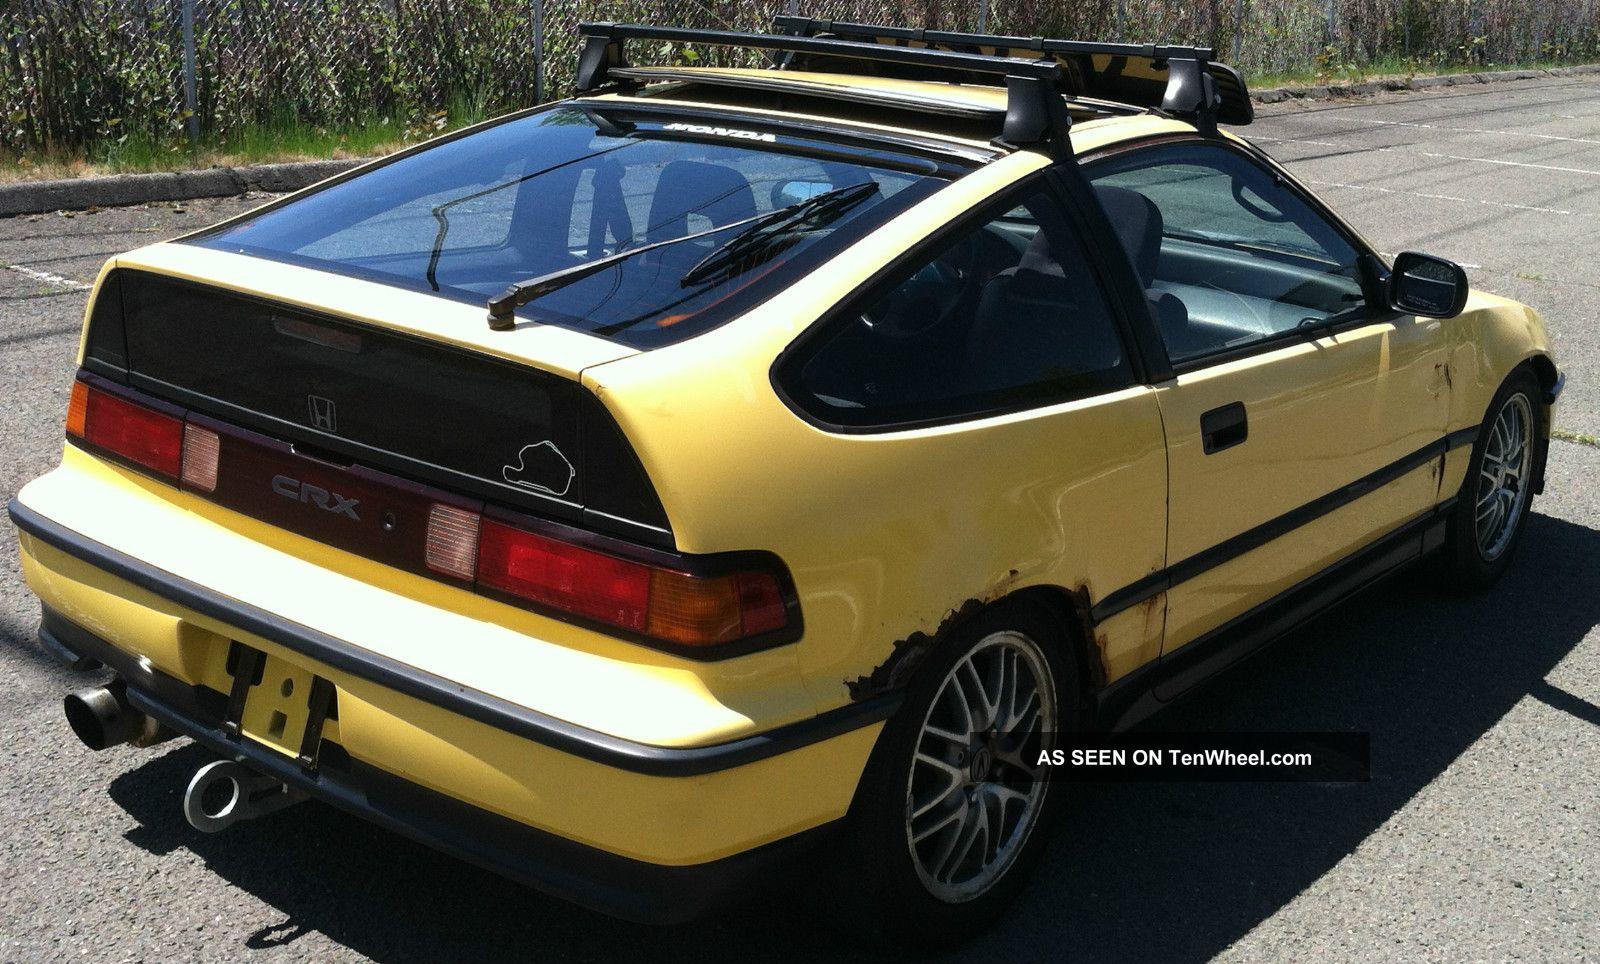 1990 Honda Crx Si Y49 Yellow W. B16 Swap